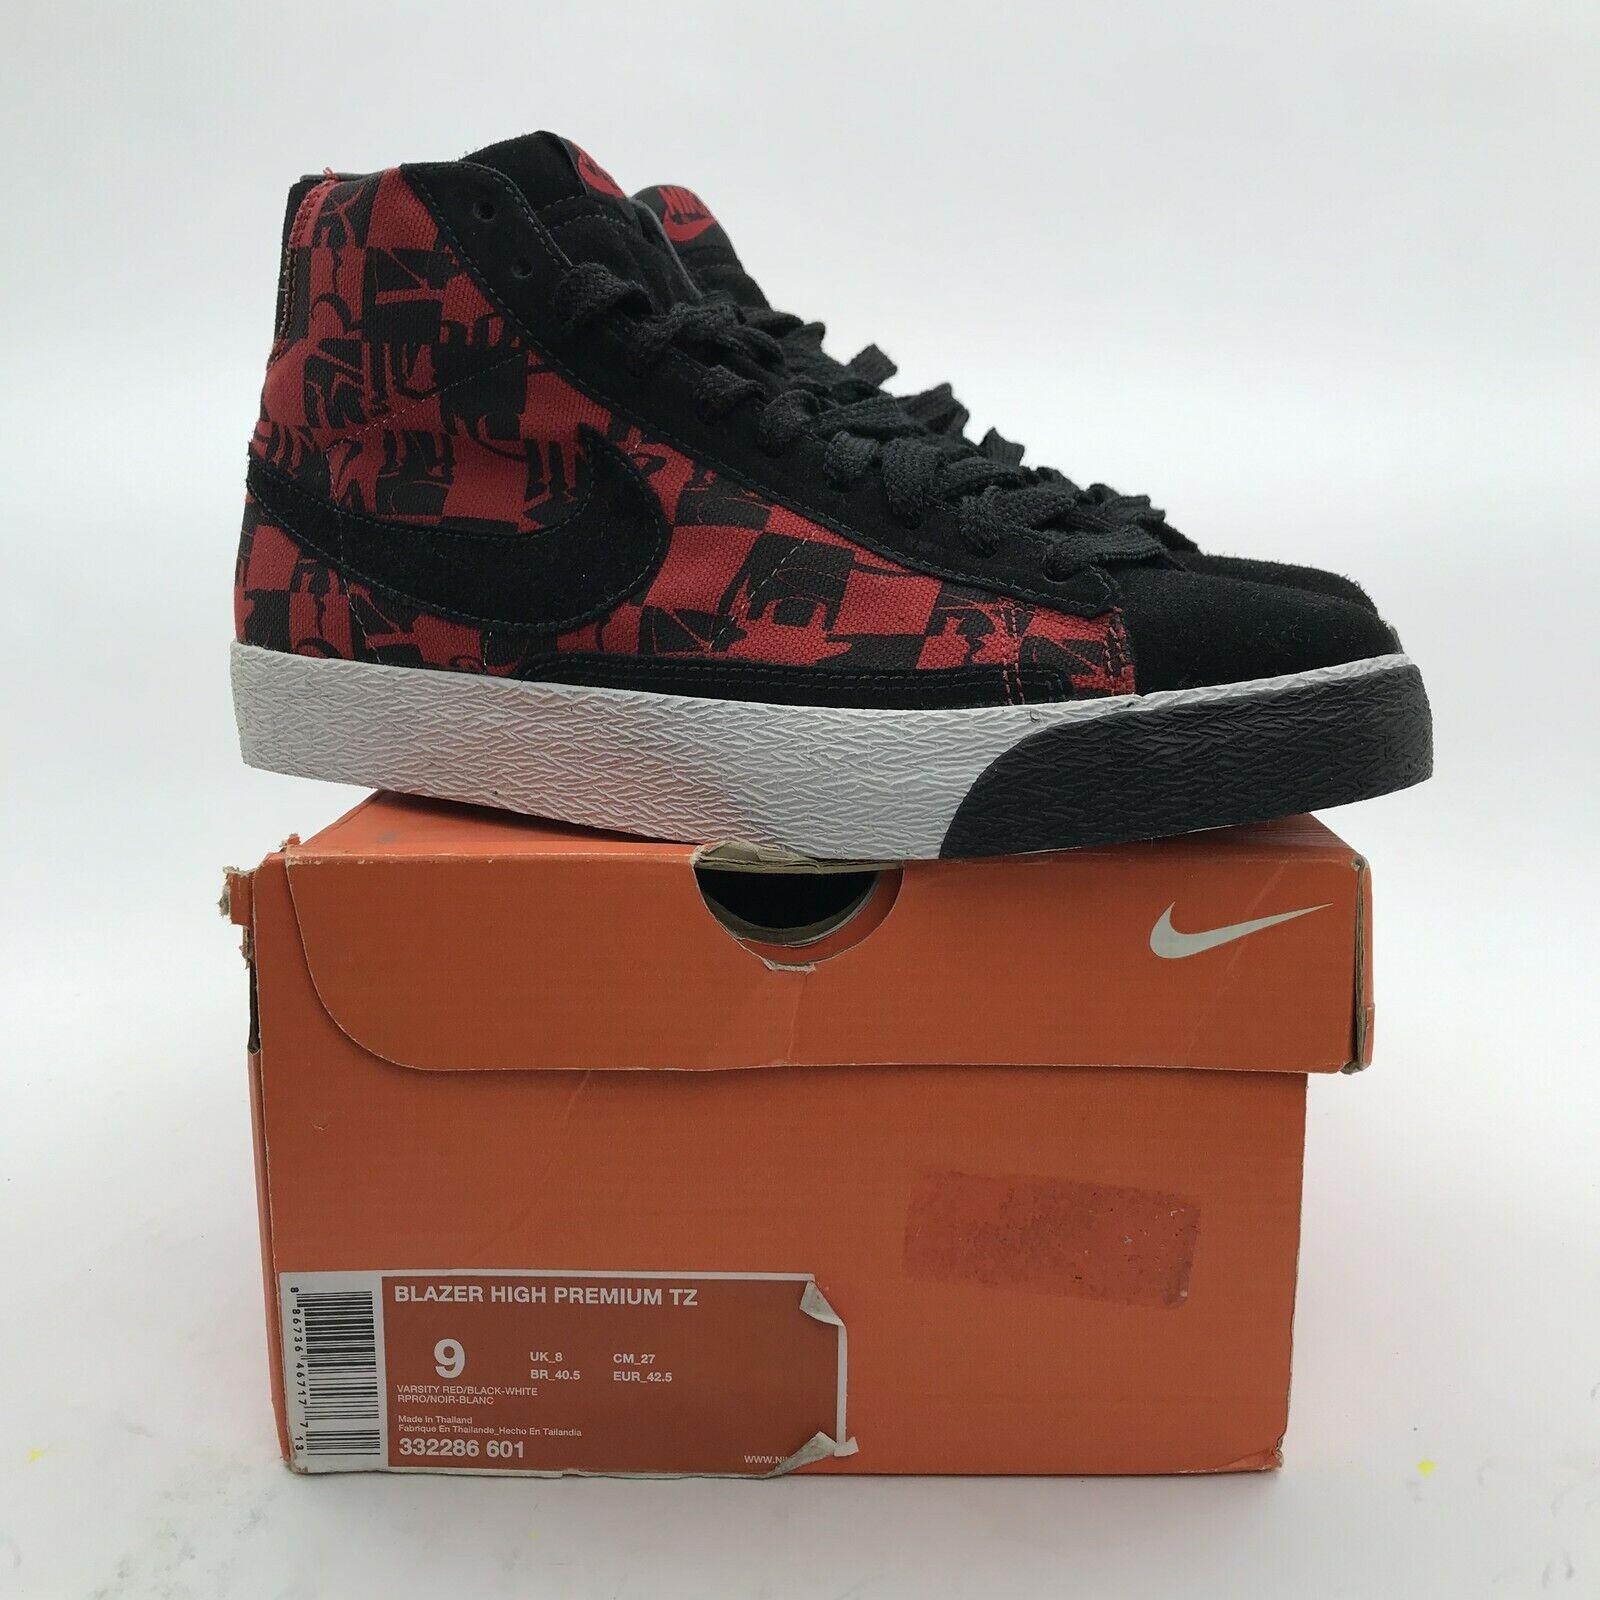 Nike Blazer High Premium TZ Stussy x Neighborhood Red LIMITED 332286-601 US 9